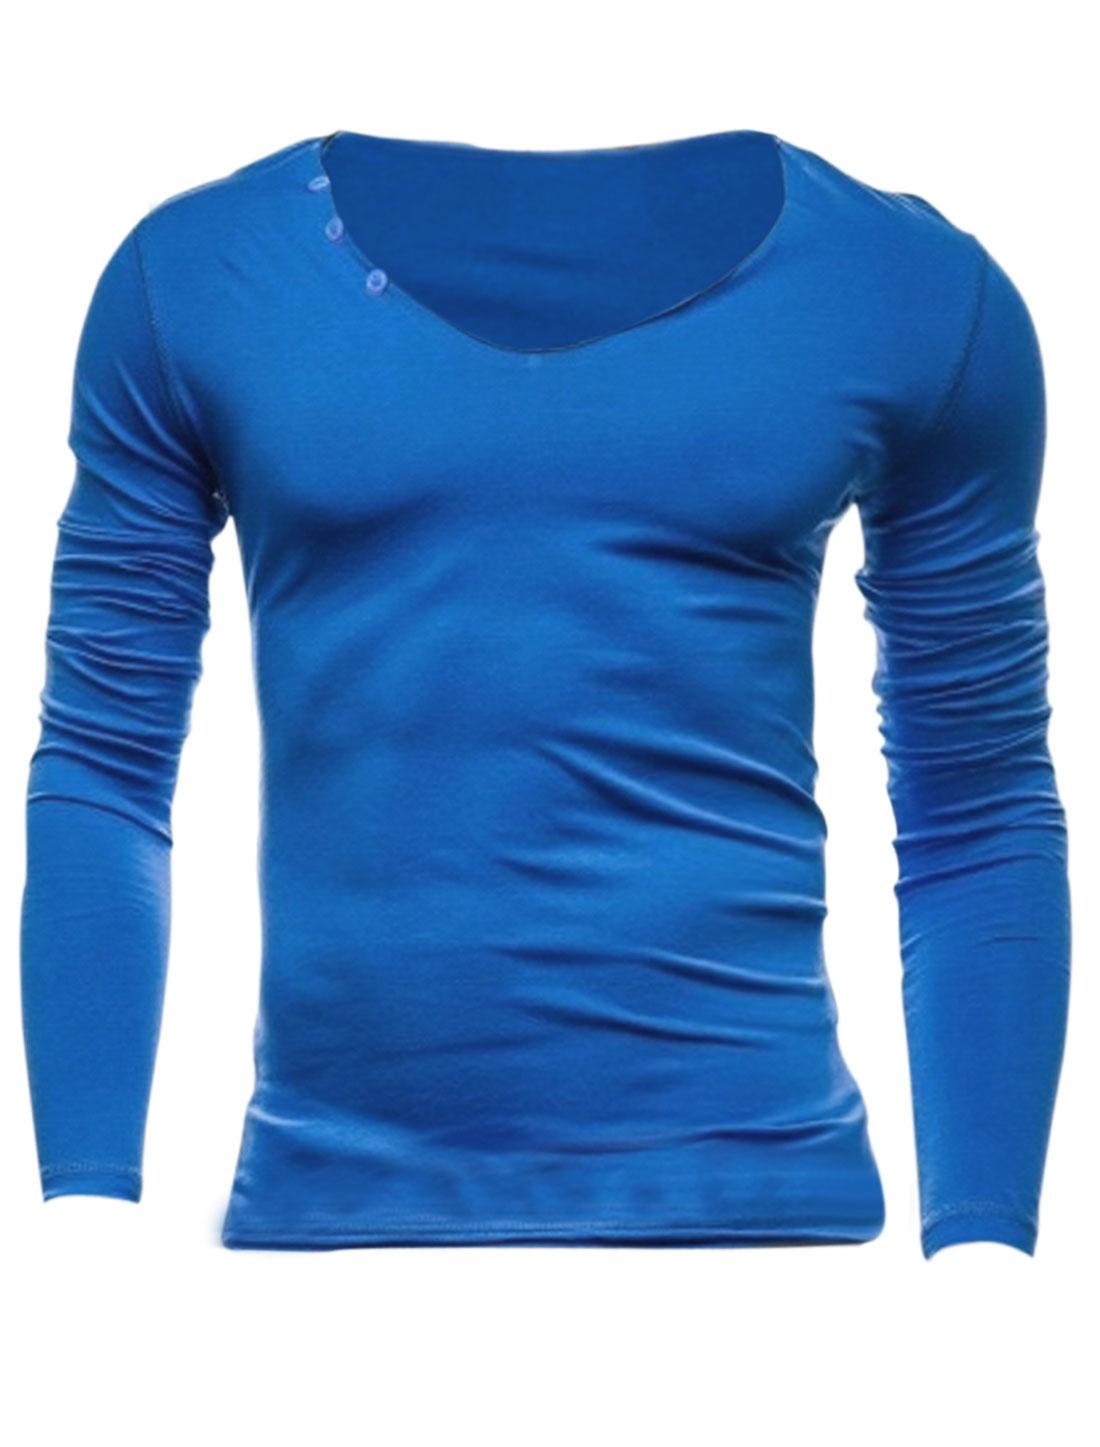 Men Pullover Round Neck Buttons Decor Leisure T-Shirt Royal Blue M